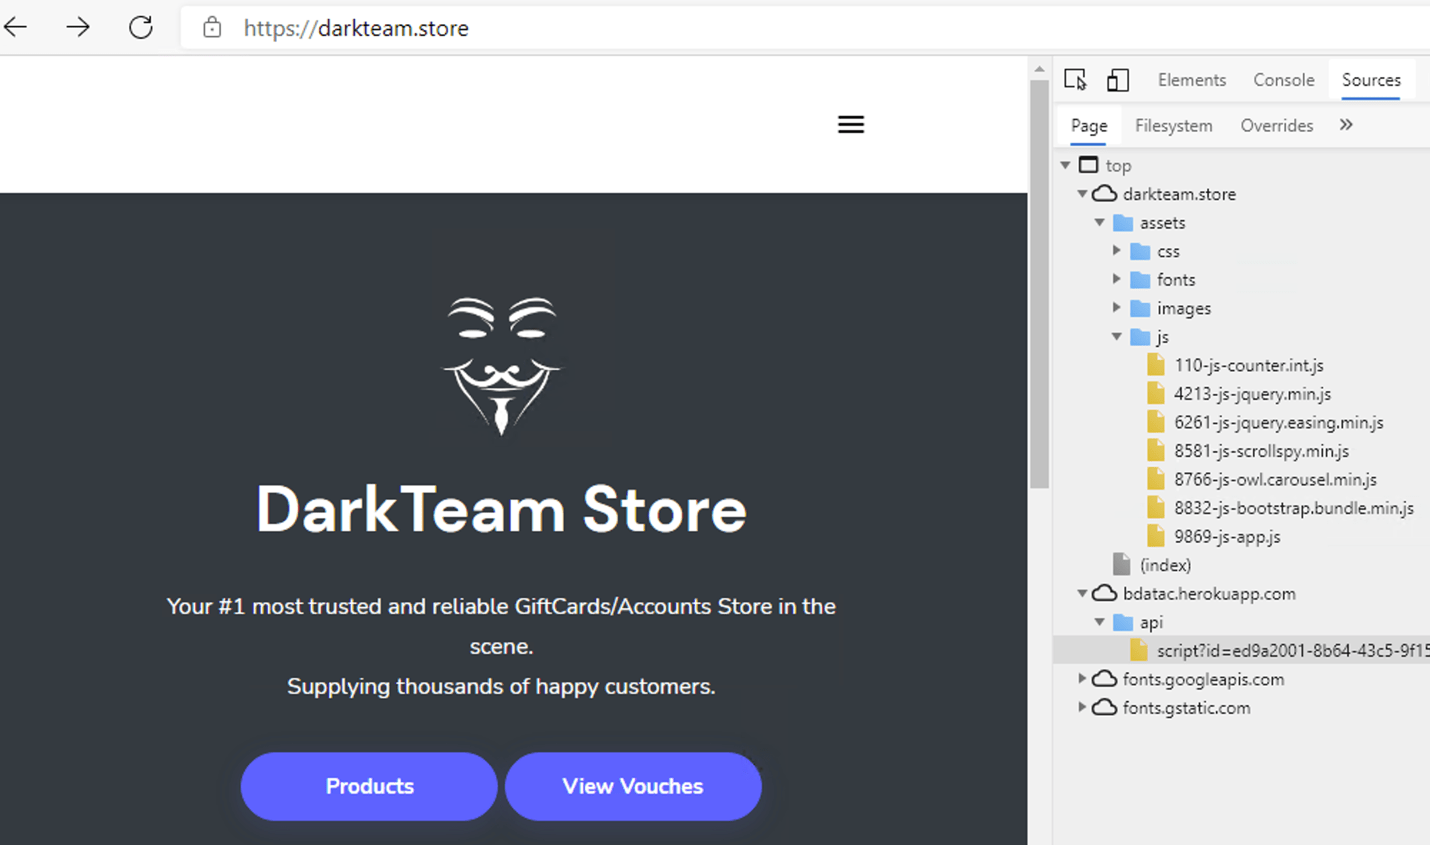 Figure 4: Browser enumeration and fingerprinting script on purported dark market site darkteam.store